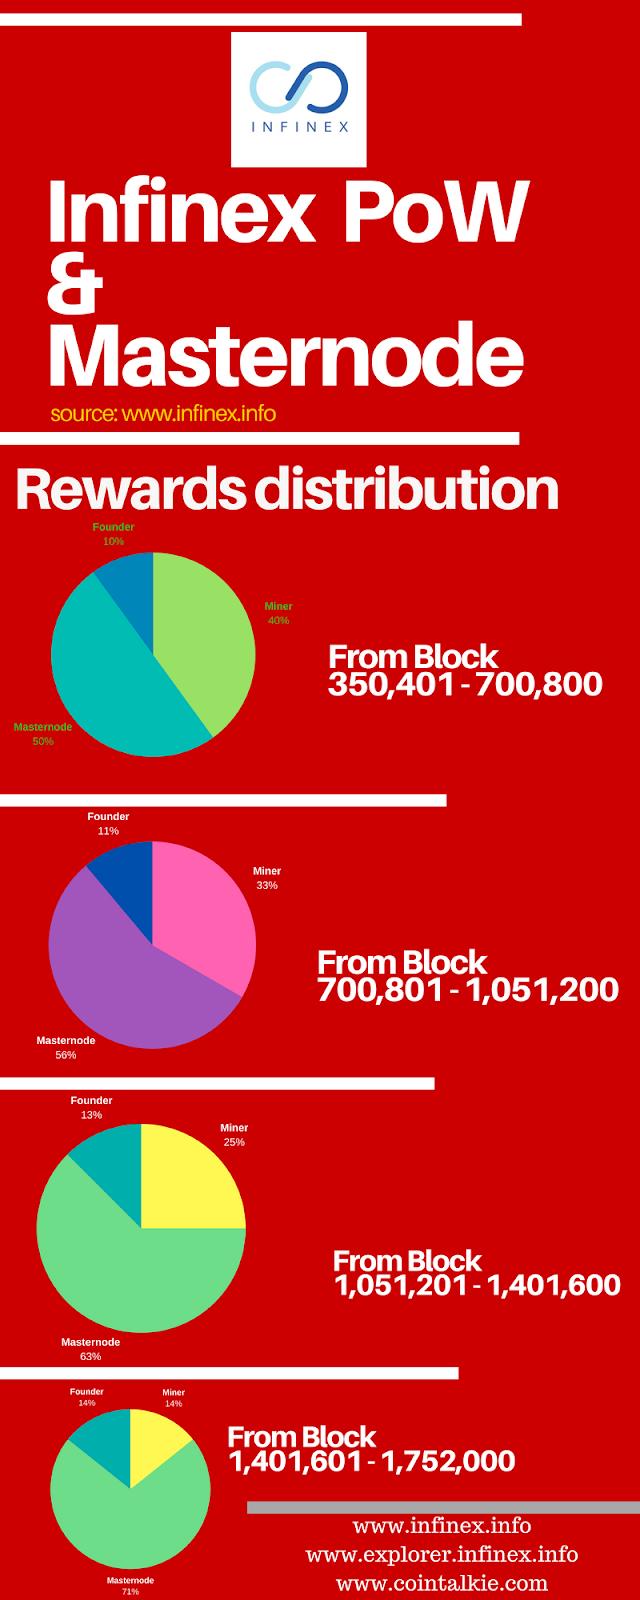 Infinex coin -Masternode Infographic